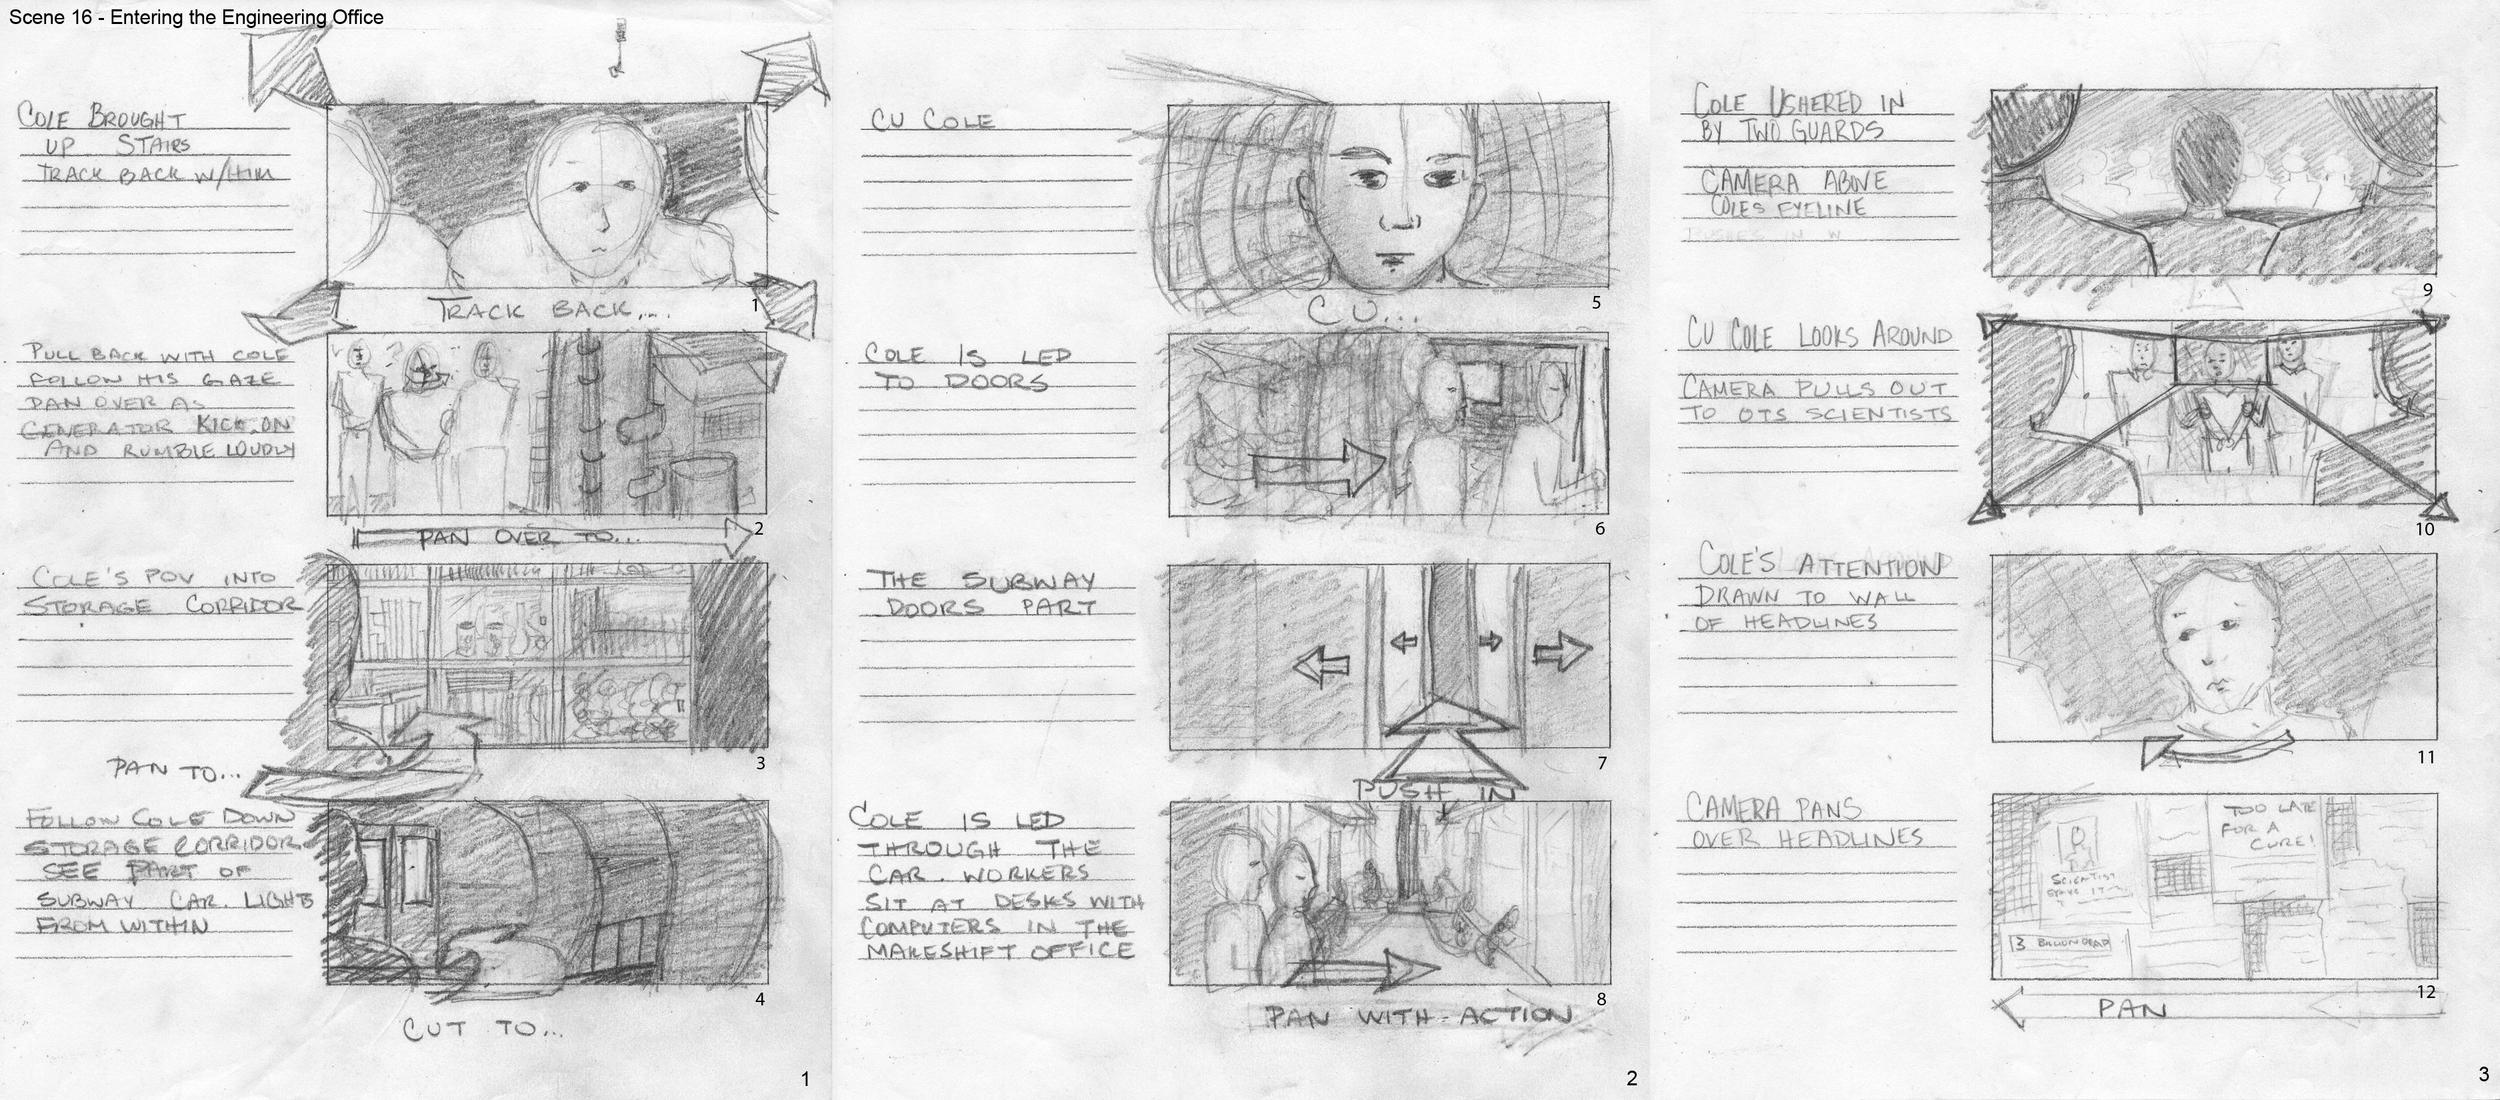 StoryboardEnteringtheEngineeringOffice.jpg